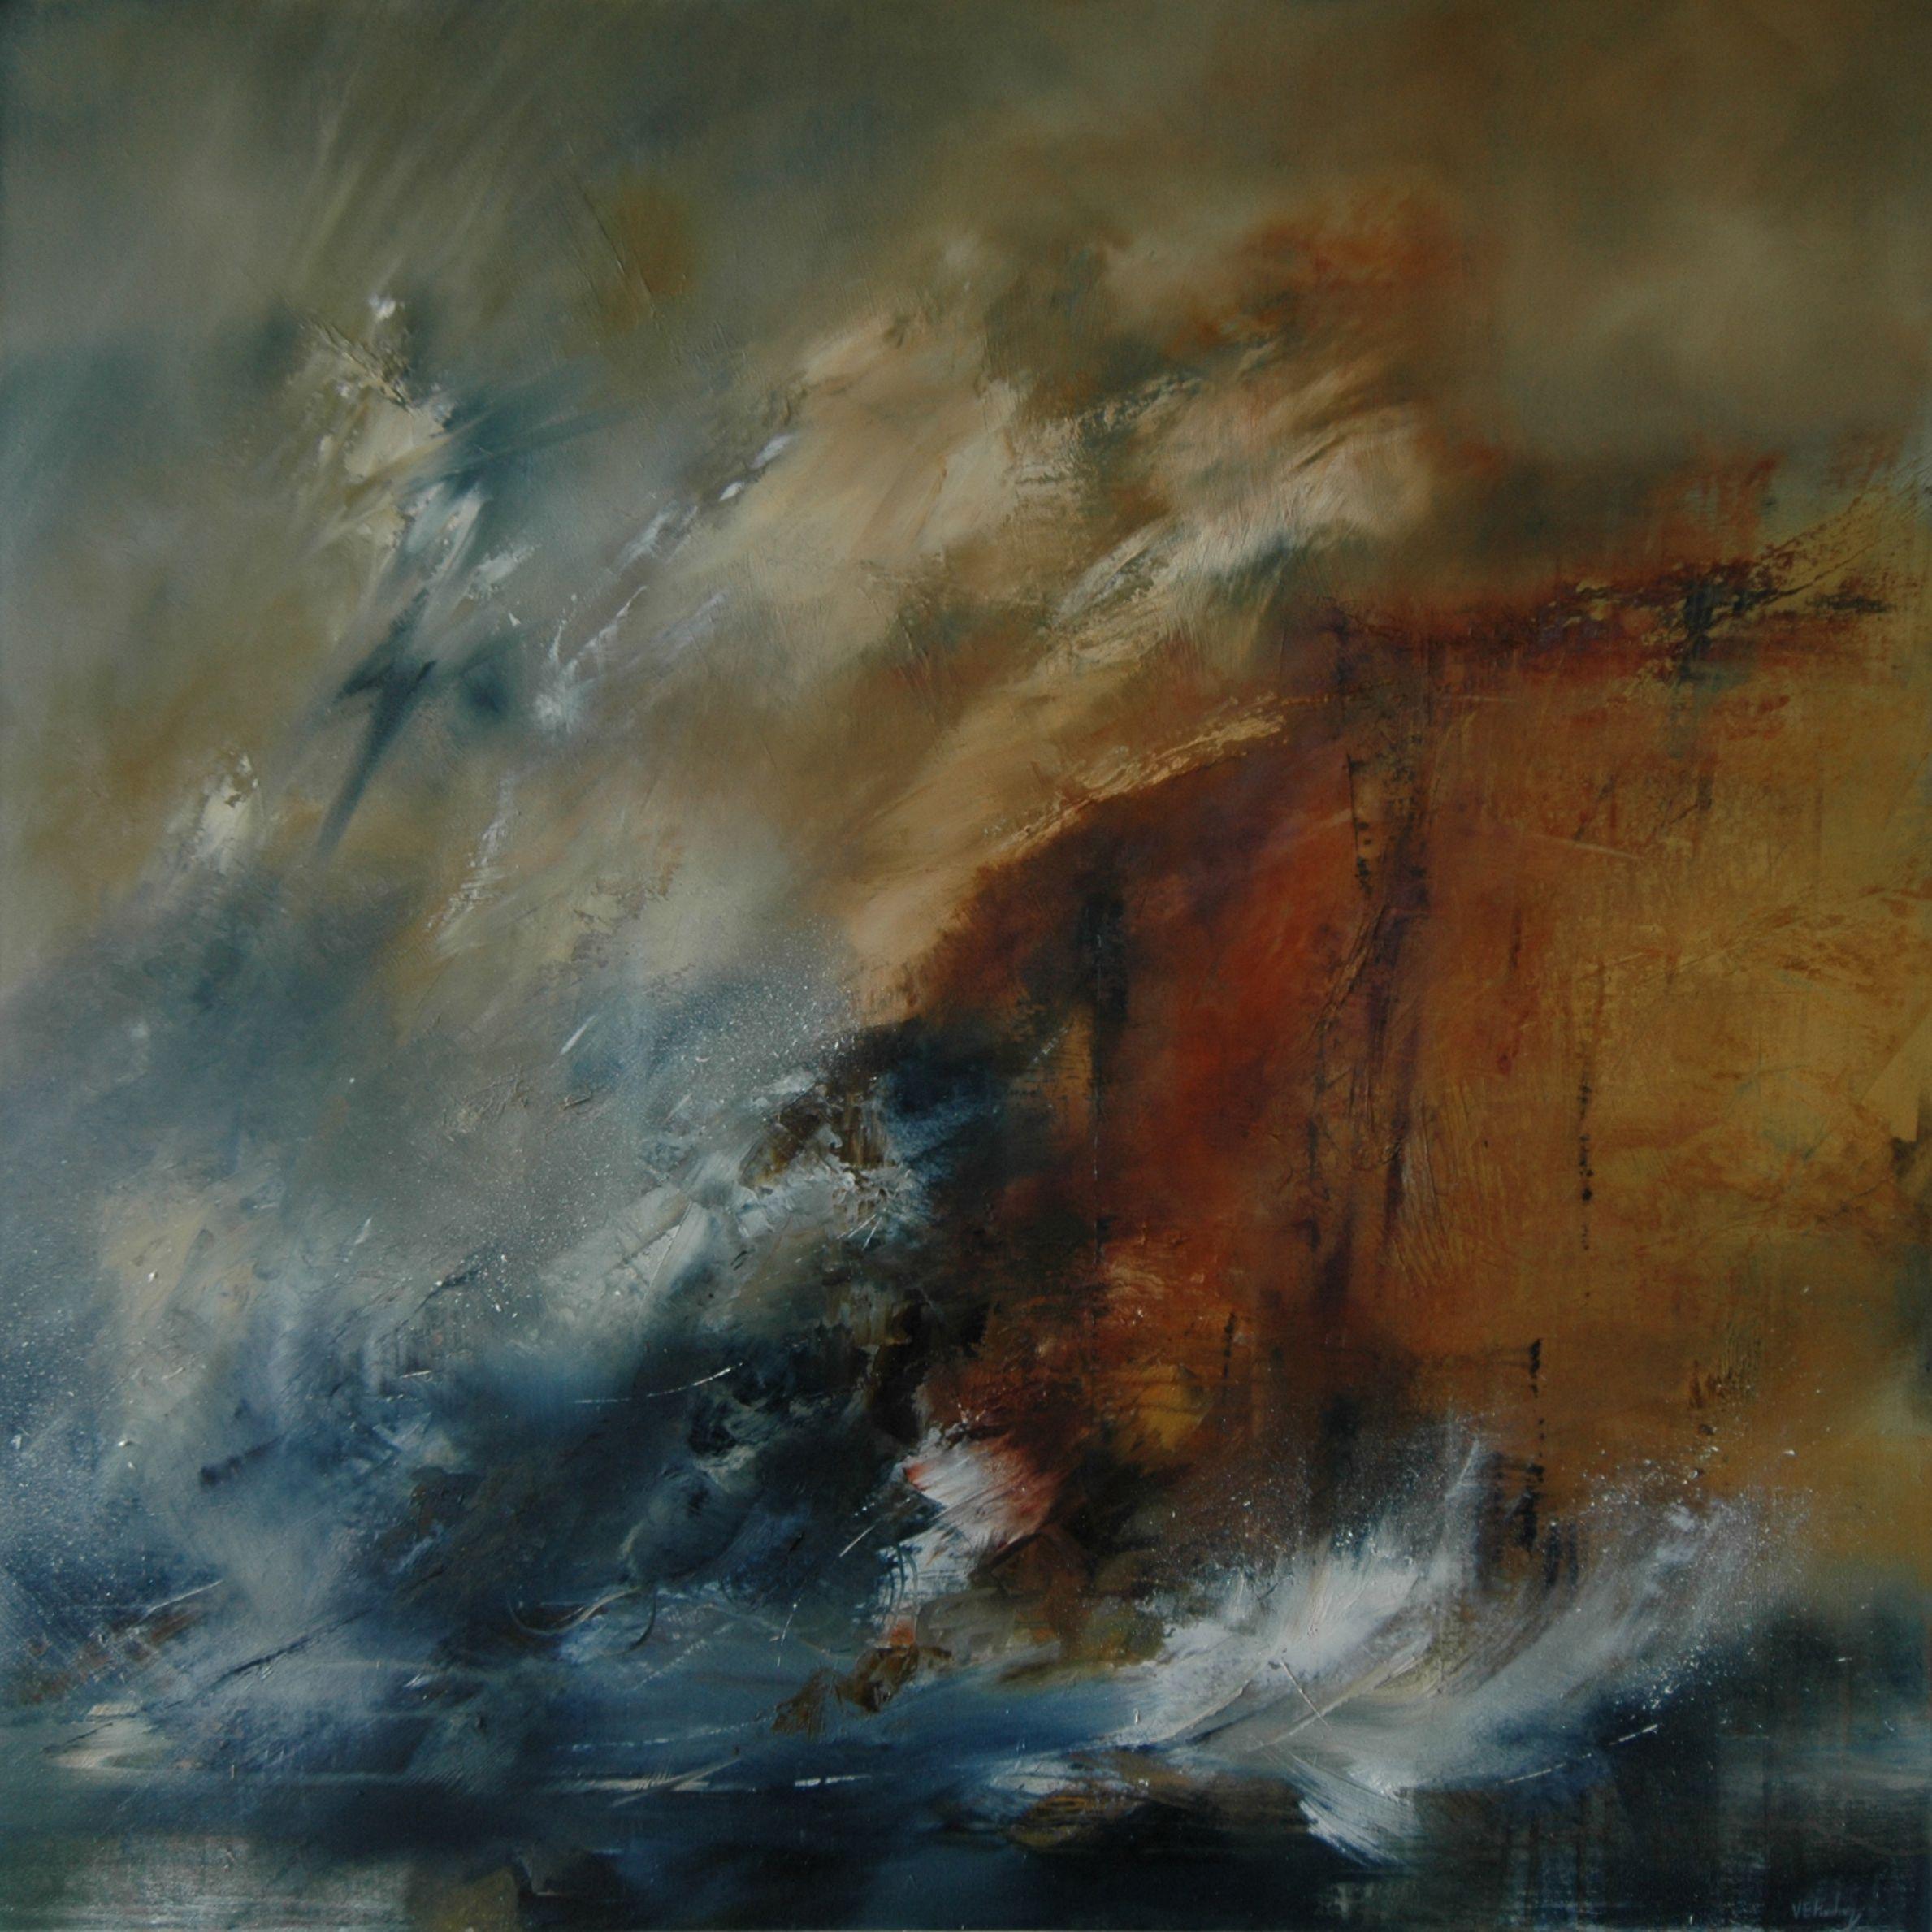 Vicky Finding - Erosion - oil on canvas - 92cm x 92cm.jpg